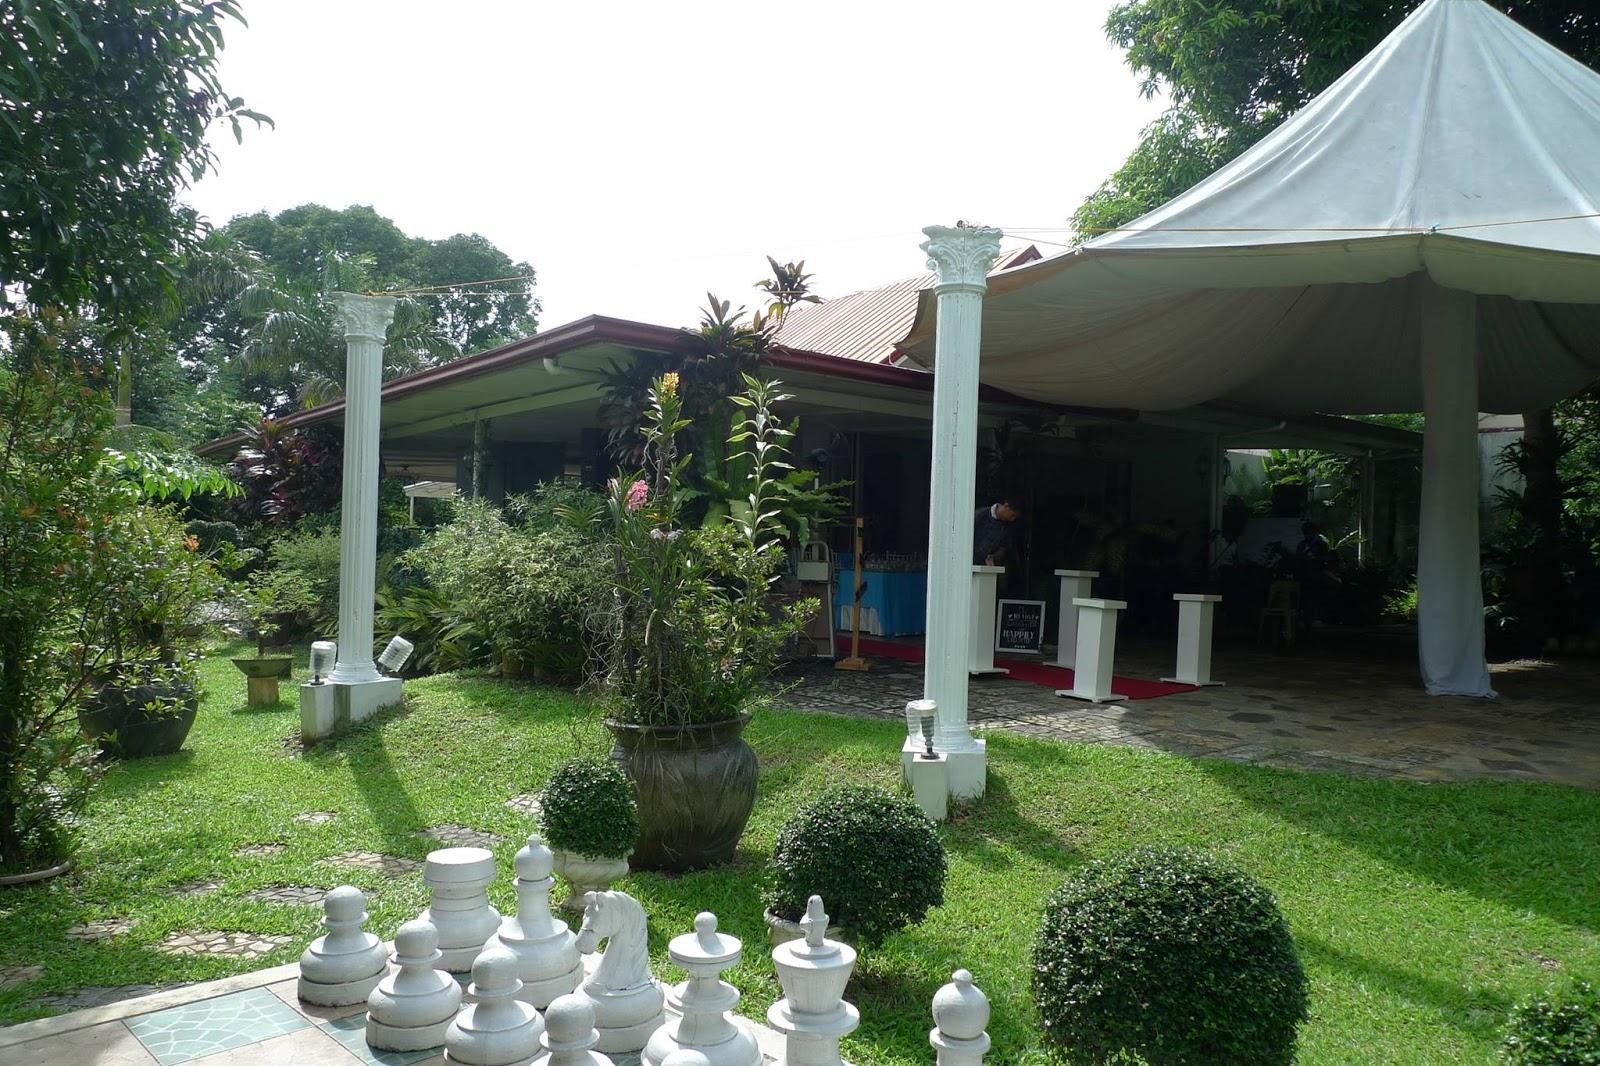 Garden wedding venues in antipolo mommy practicality for Garden wedding venues